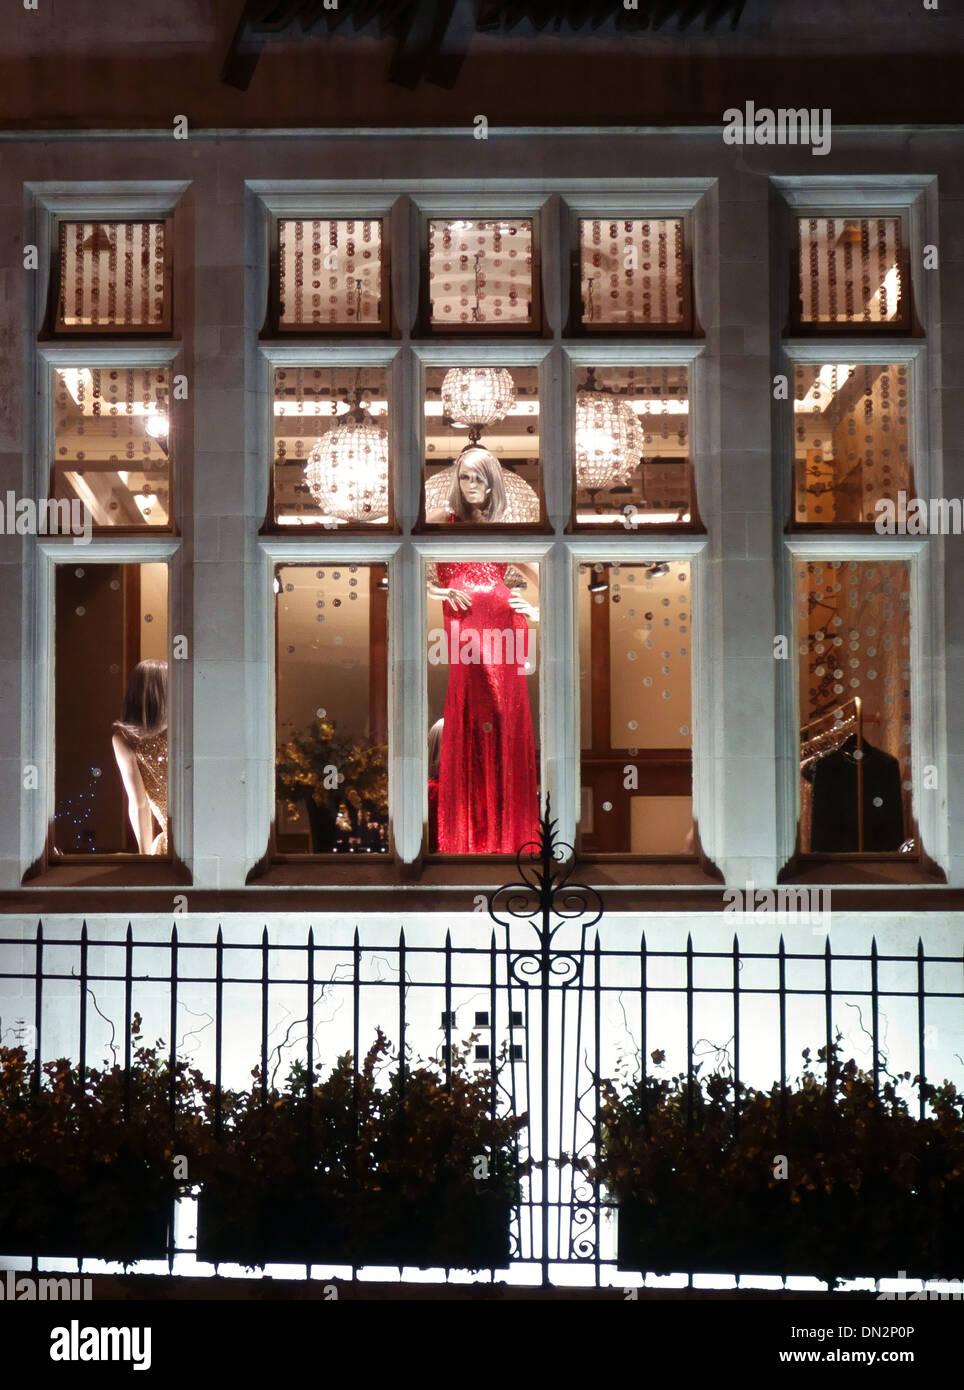 Jenny Packham fashion store, Mayfair, London - Stock Image